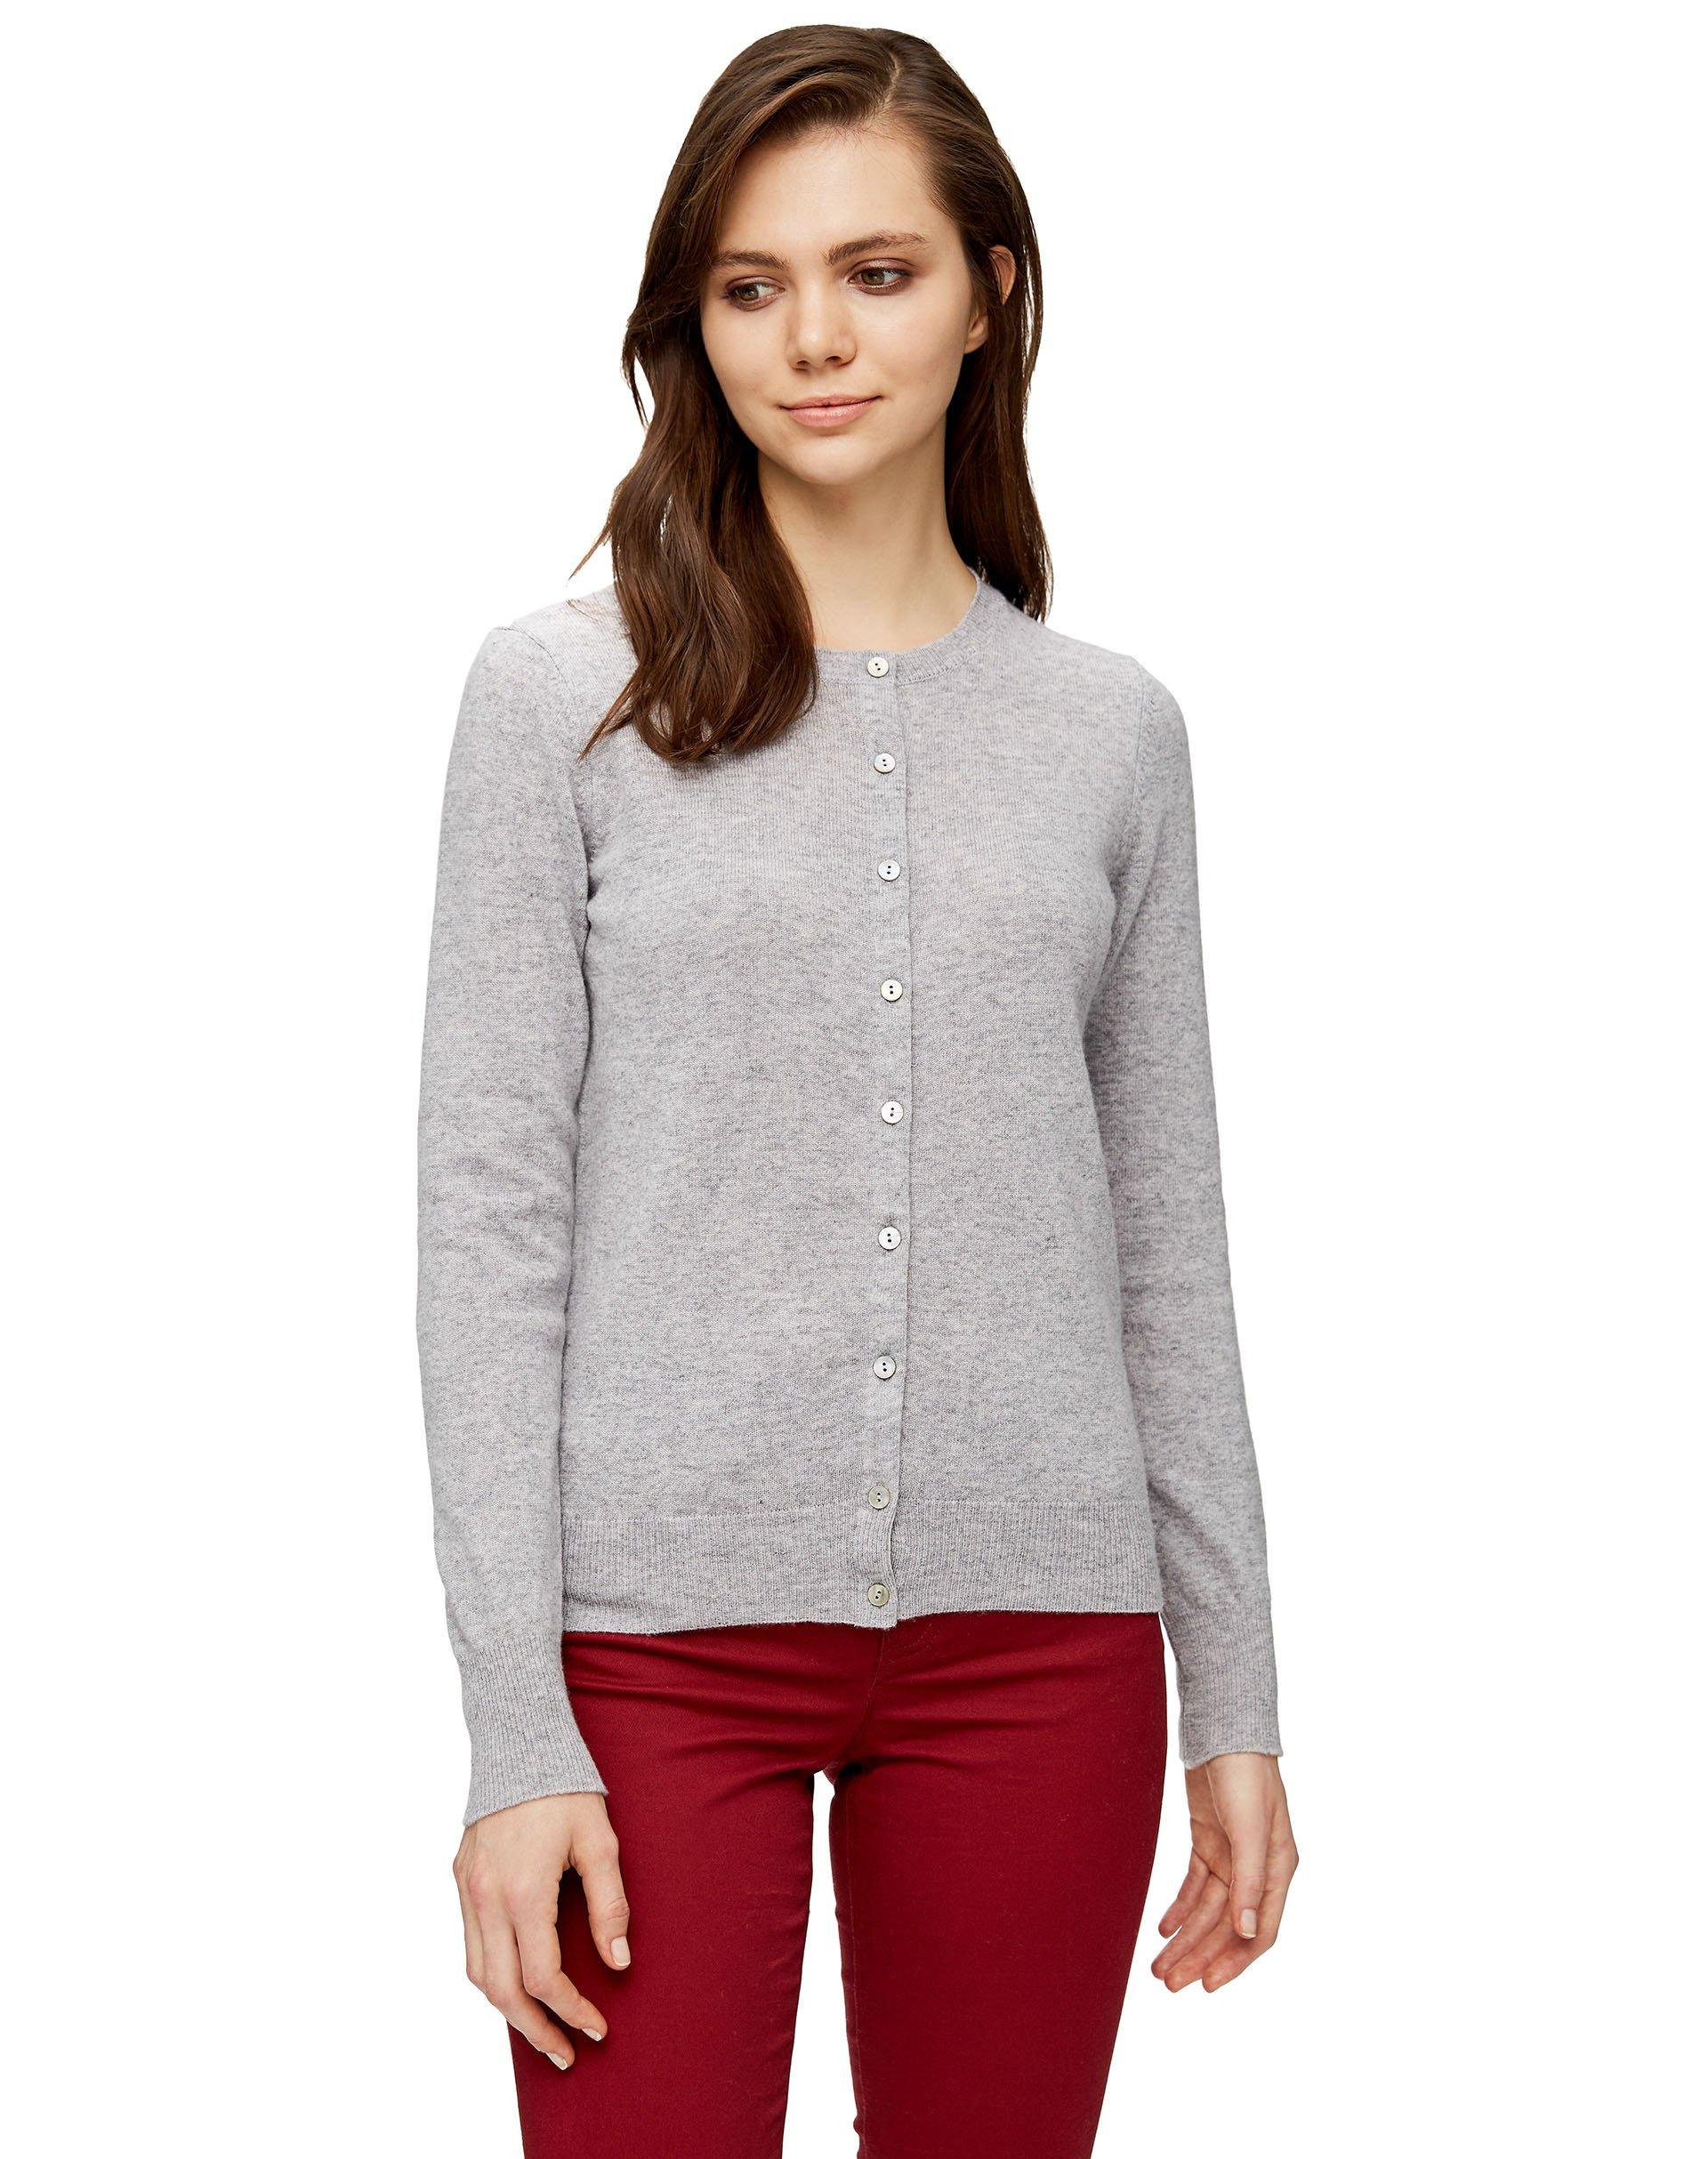 КардиганКардиганы<br>Кардиган с длинным рукавом из 100% шерсти.<br>Цвет: Серый; Размер: XS;